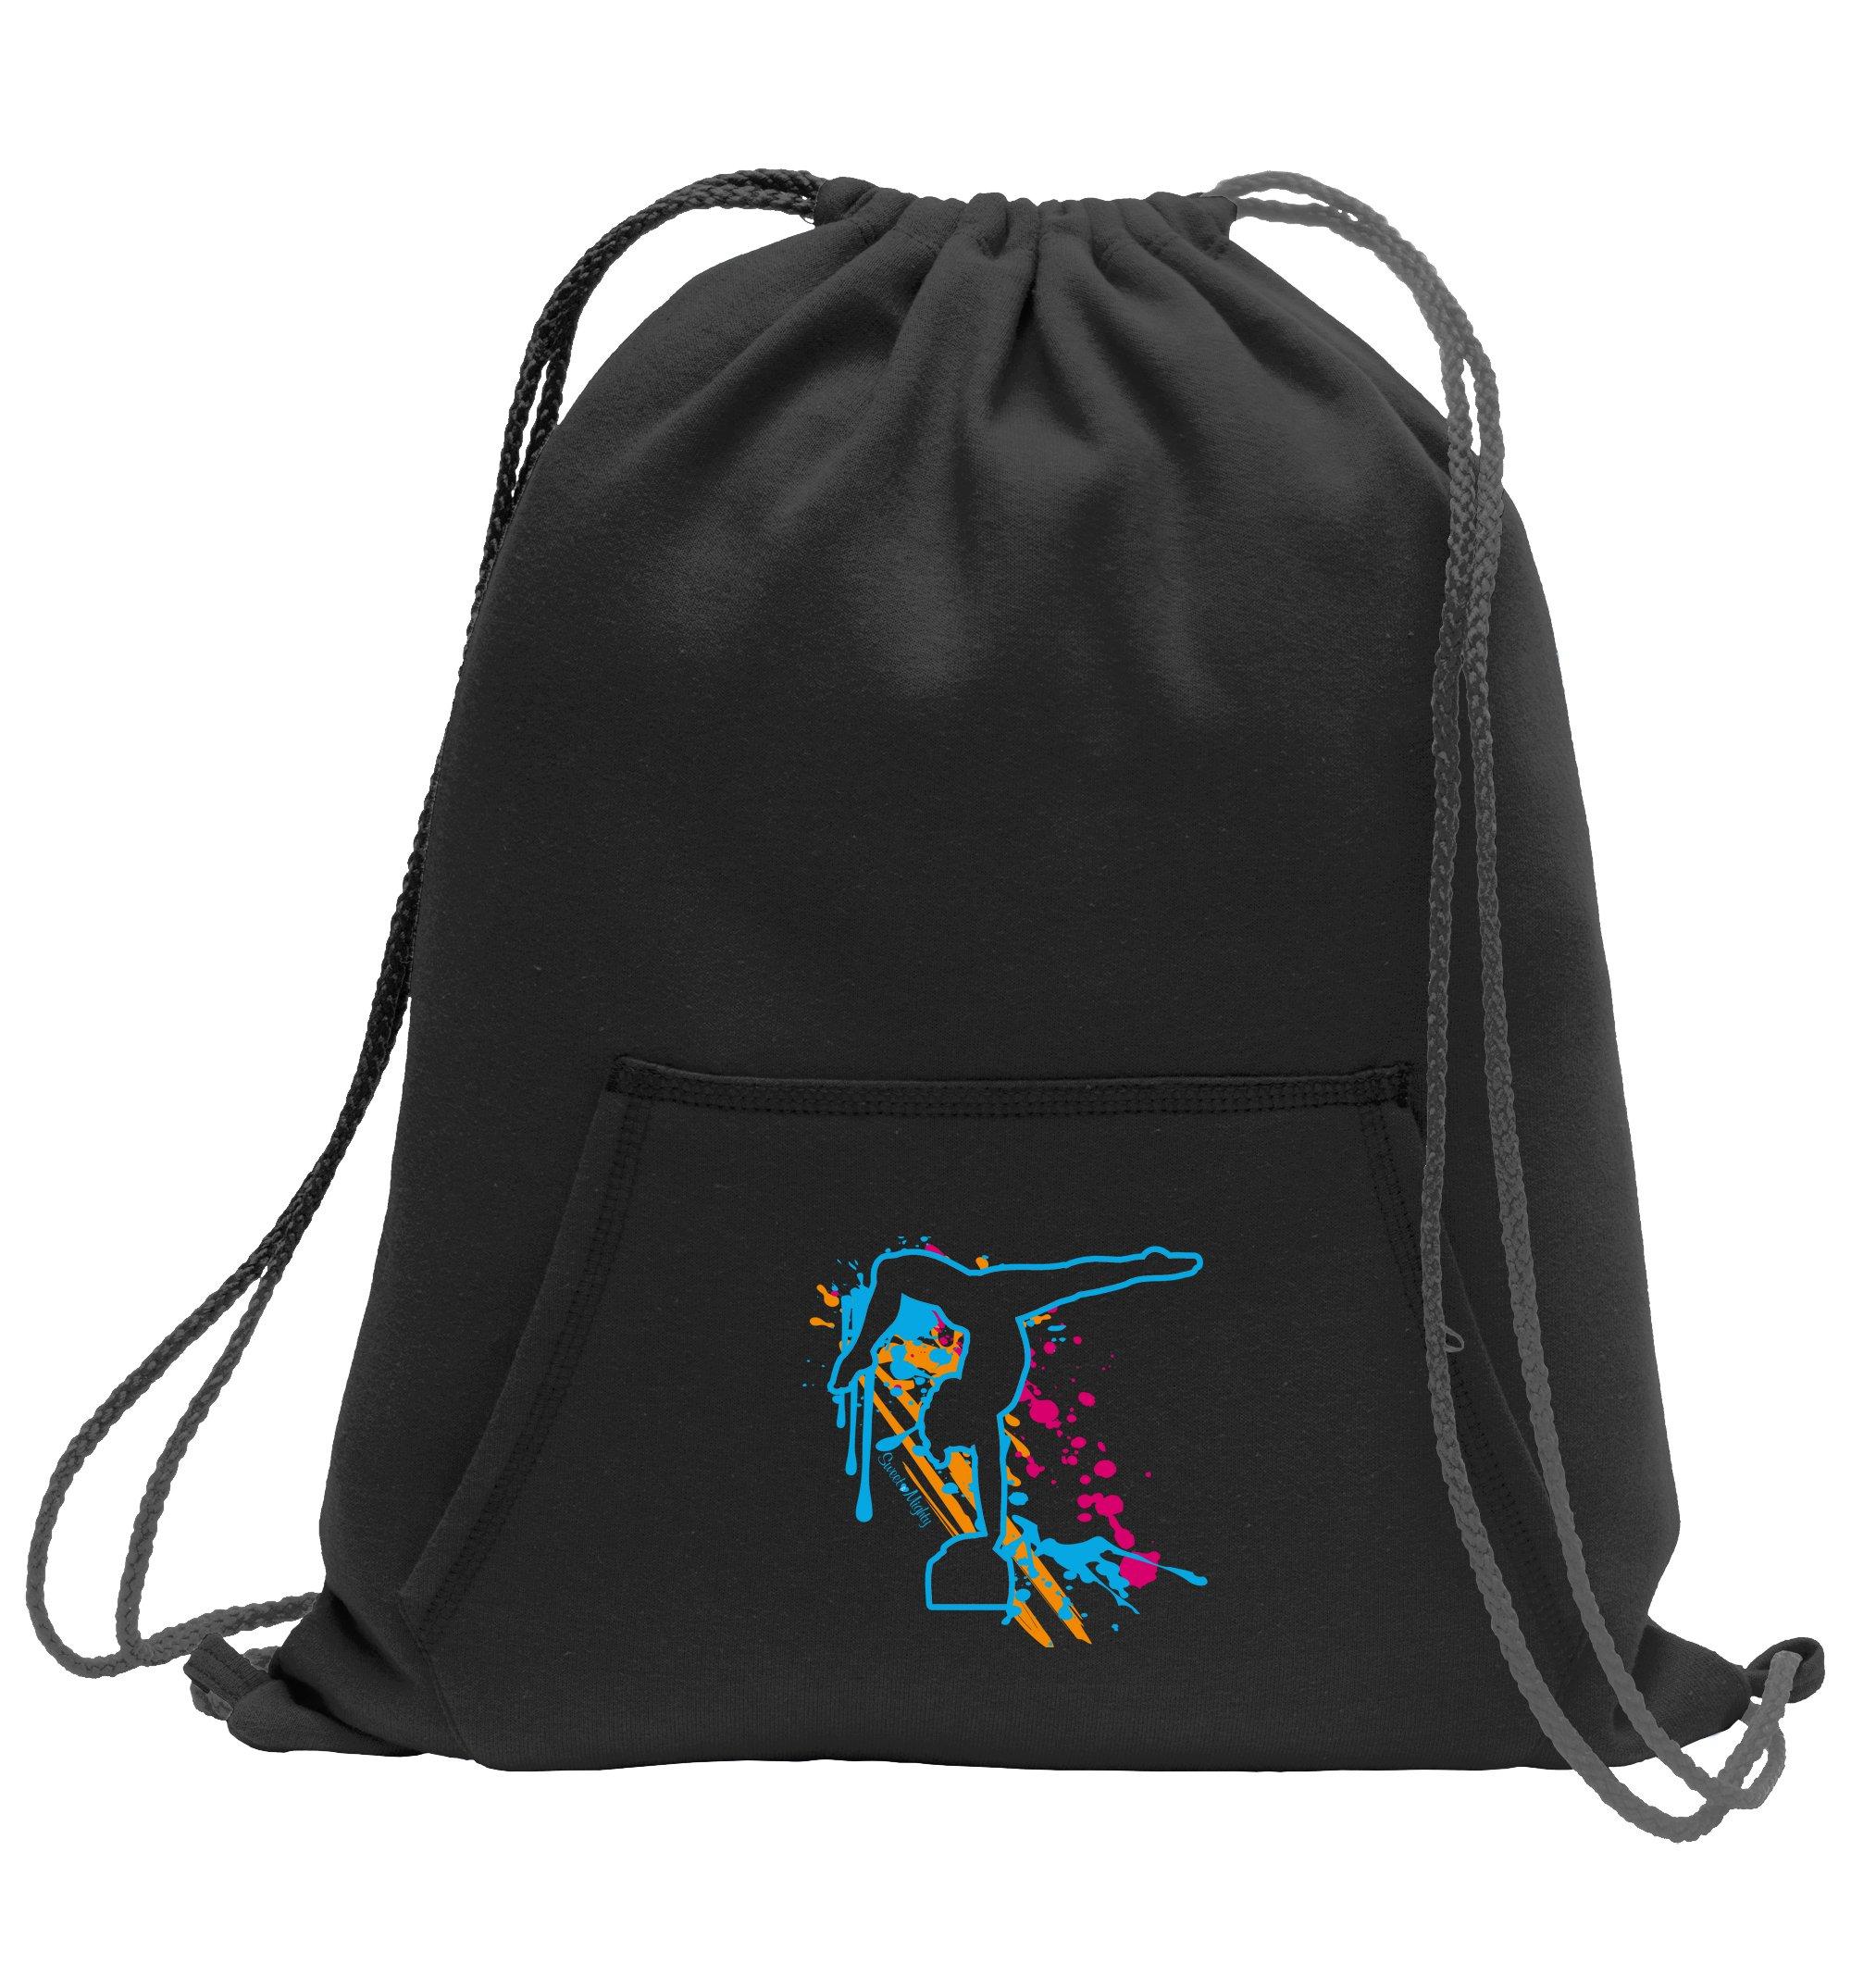 Sweet & Mighty Gymnastics Sweatshirt Cinch Bag with Kangaroo Pocket and Sport Splash Design (Jet Black)